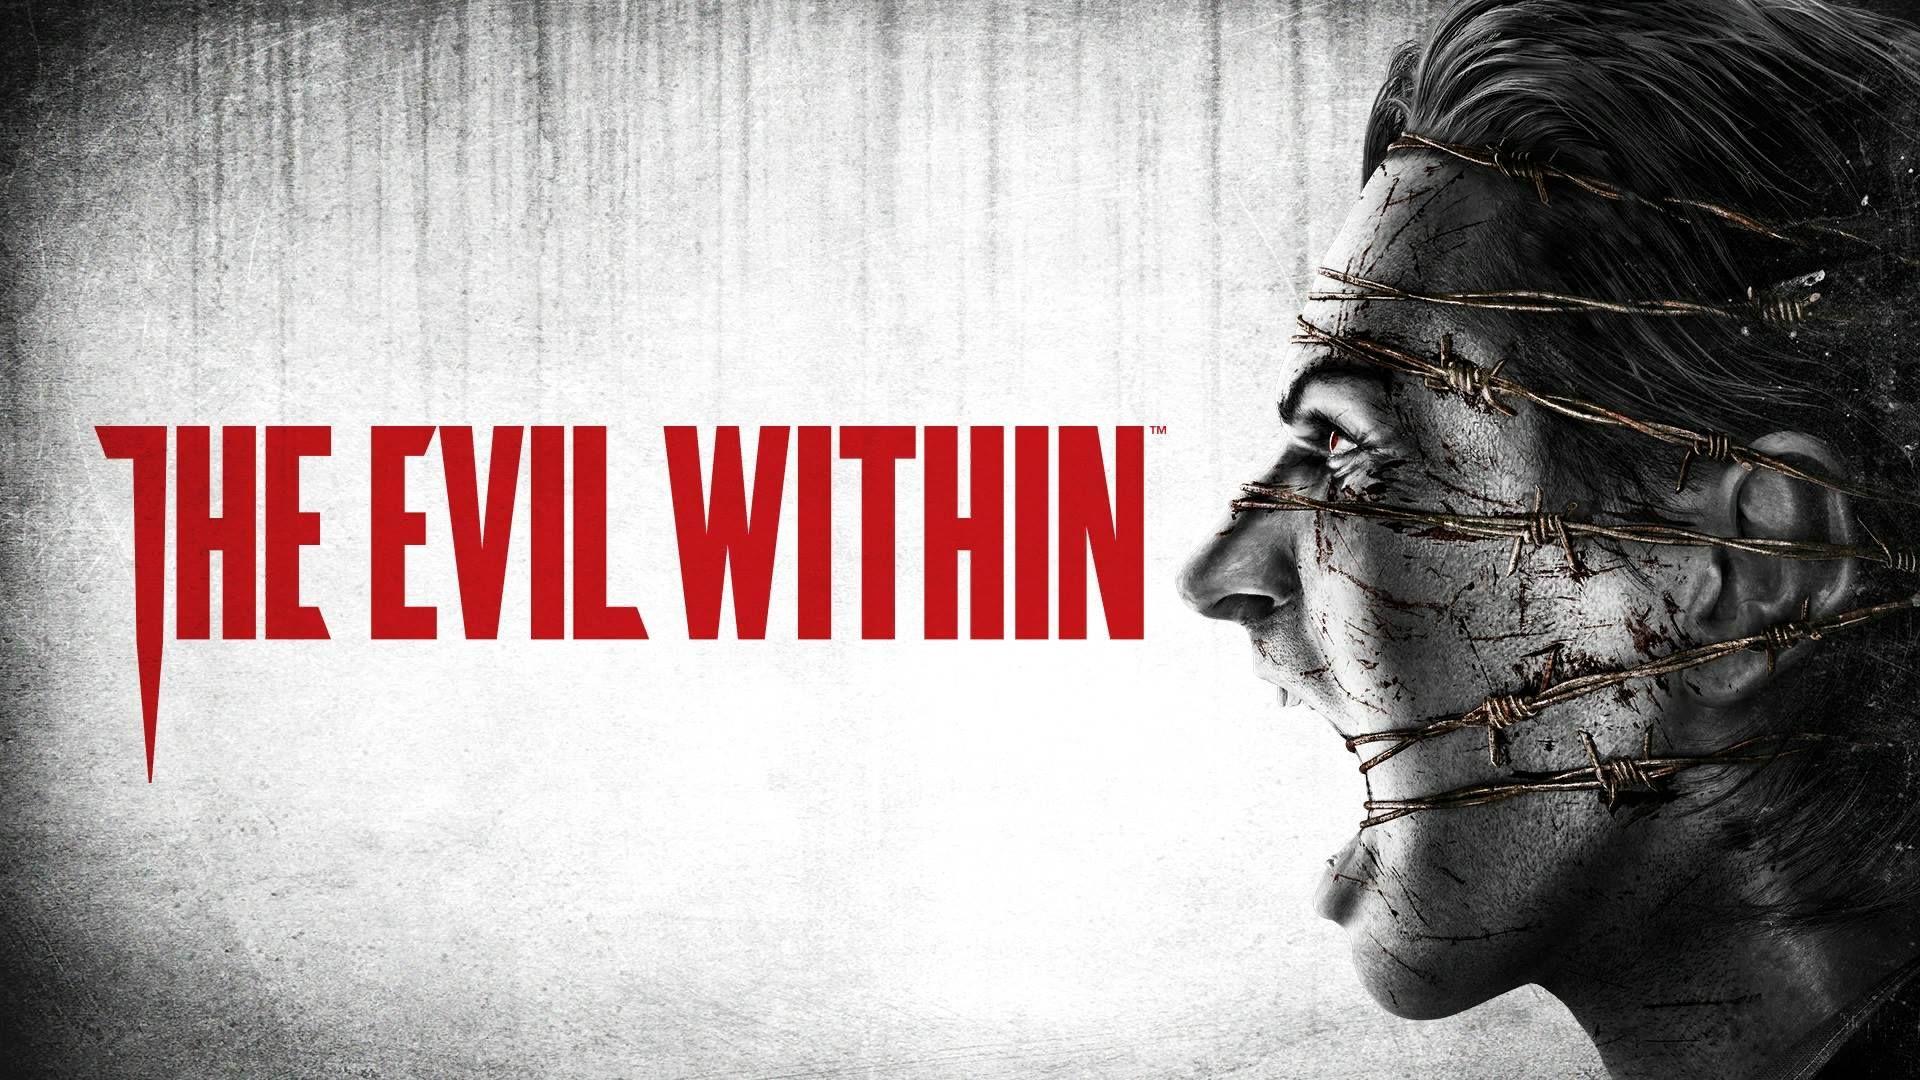 Wallpaper HD The Evil Within TheEvilWithin EvilWithin SurvivalHorror Rubik Terror SebastianCastellanos Besthesda